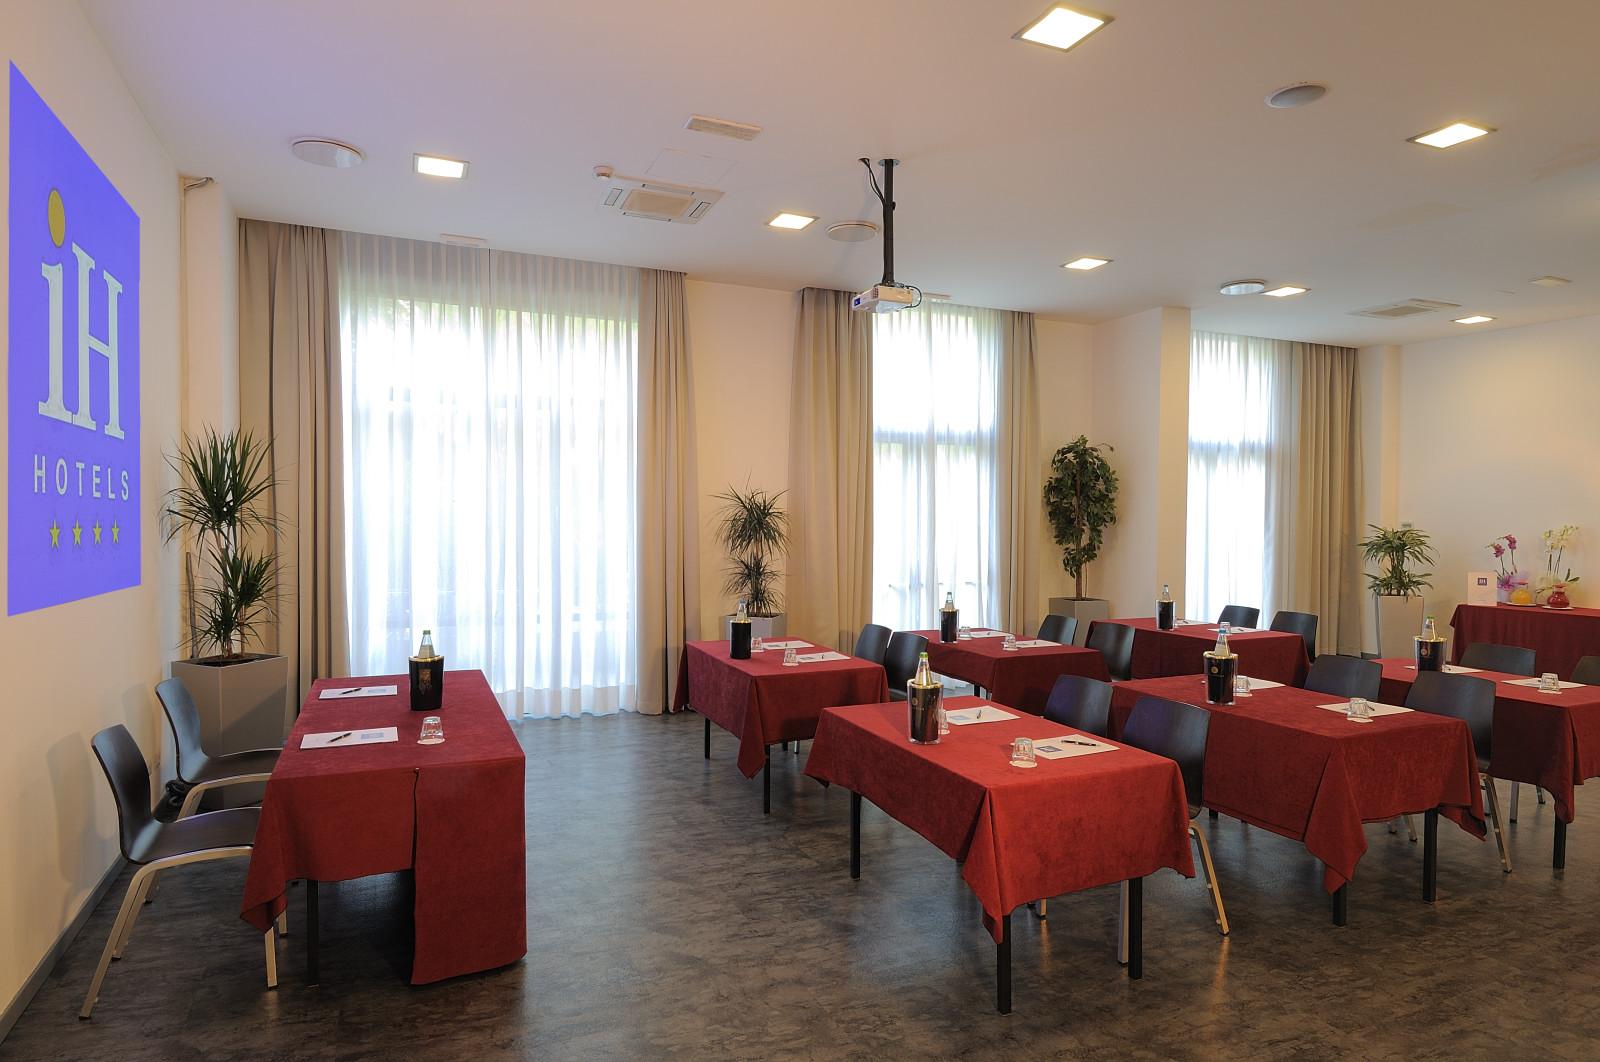 IH Hotels Milano Lorenteggio - Meeting Room